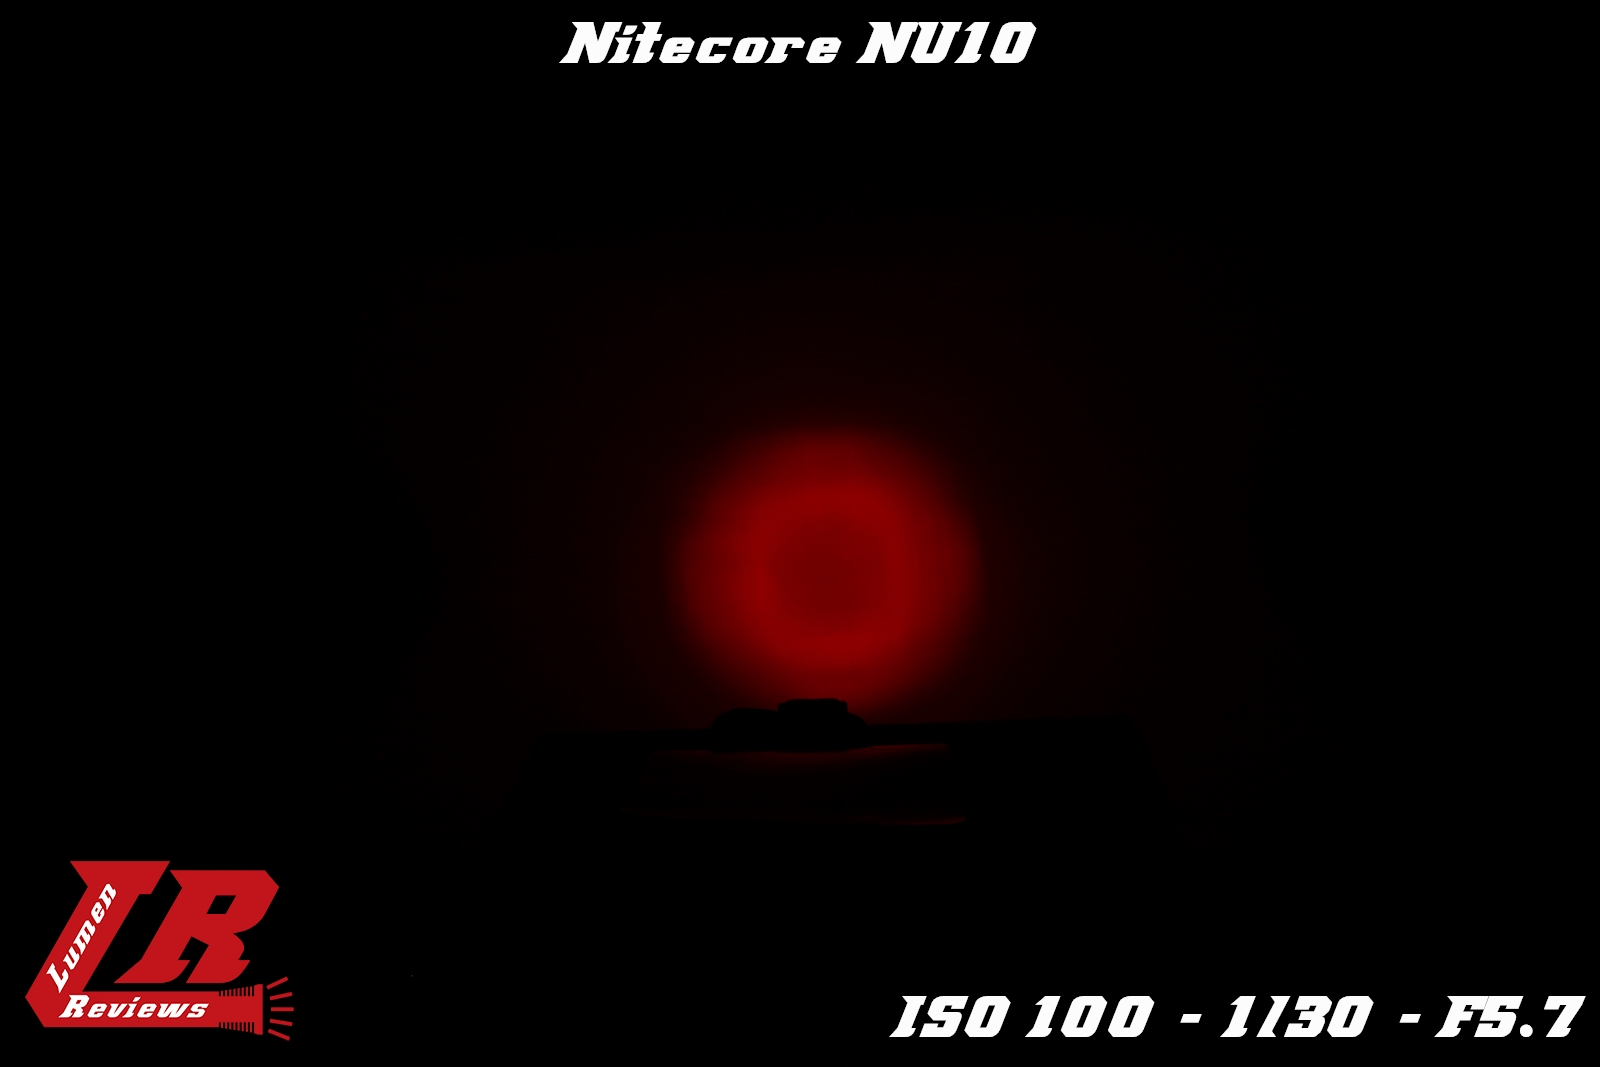 Nitecore NU10 16